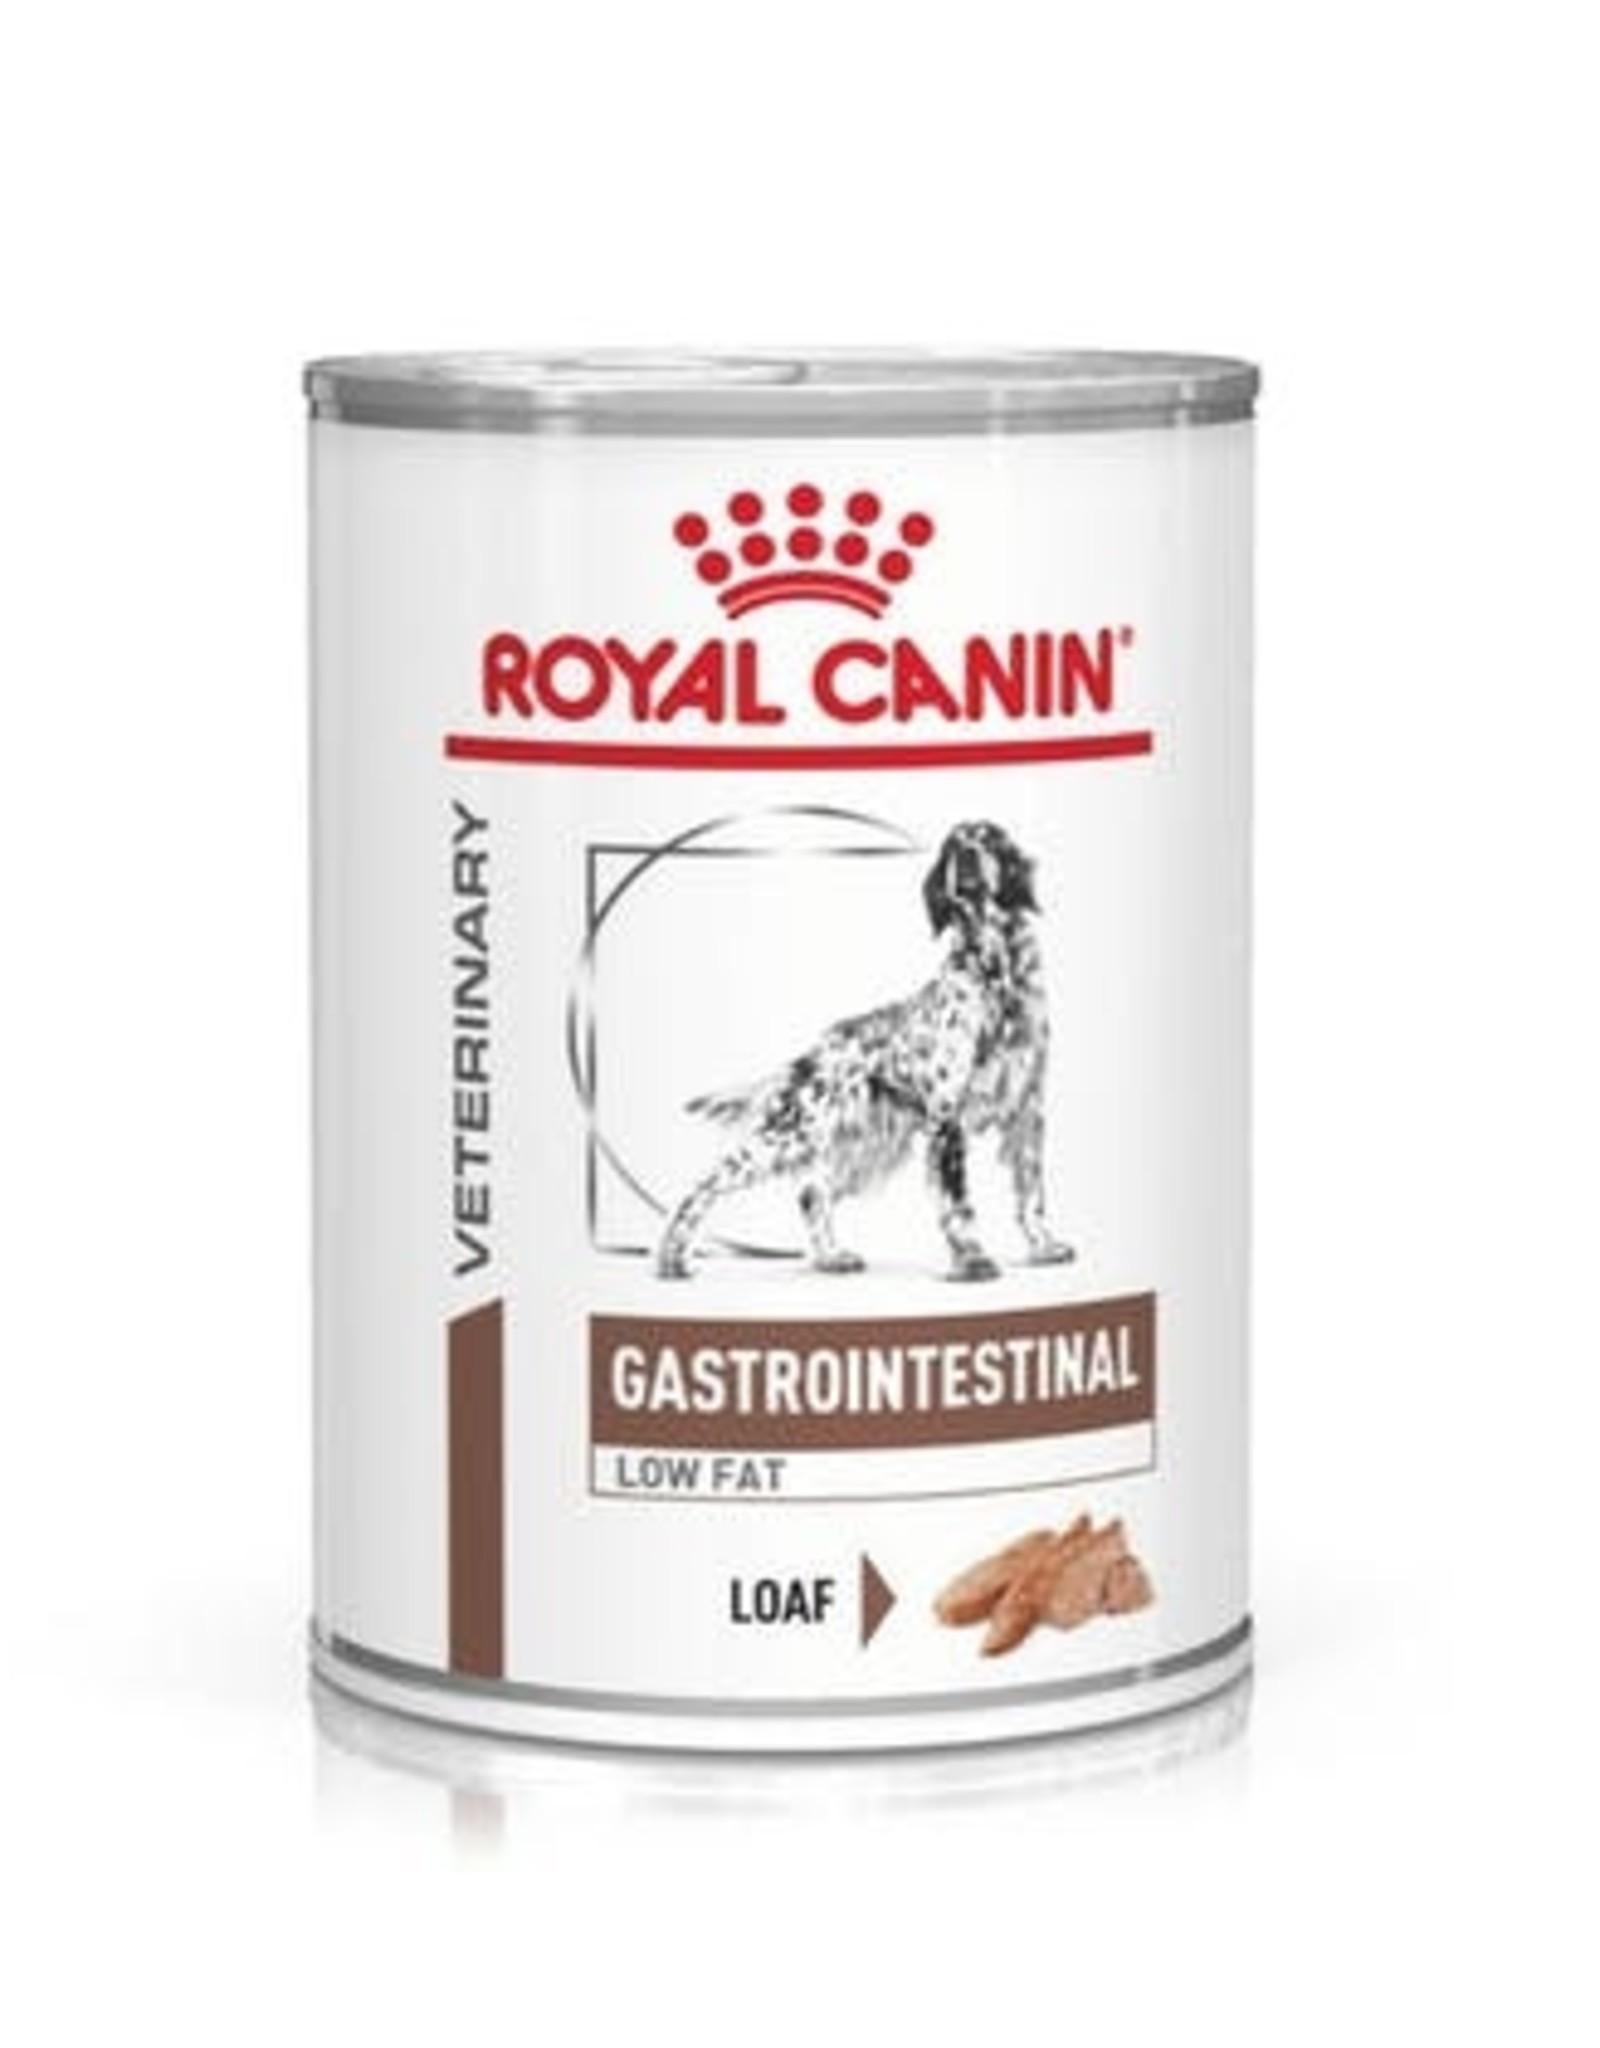 Royal Canin Royal Canin Gastro Intestinal Low Fat Hond 12x410gr